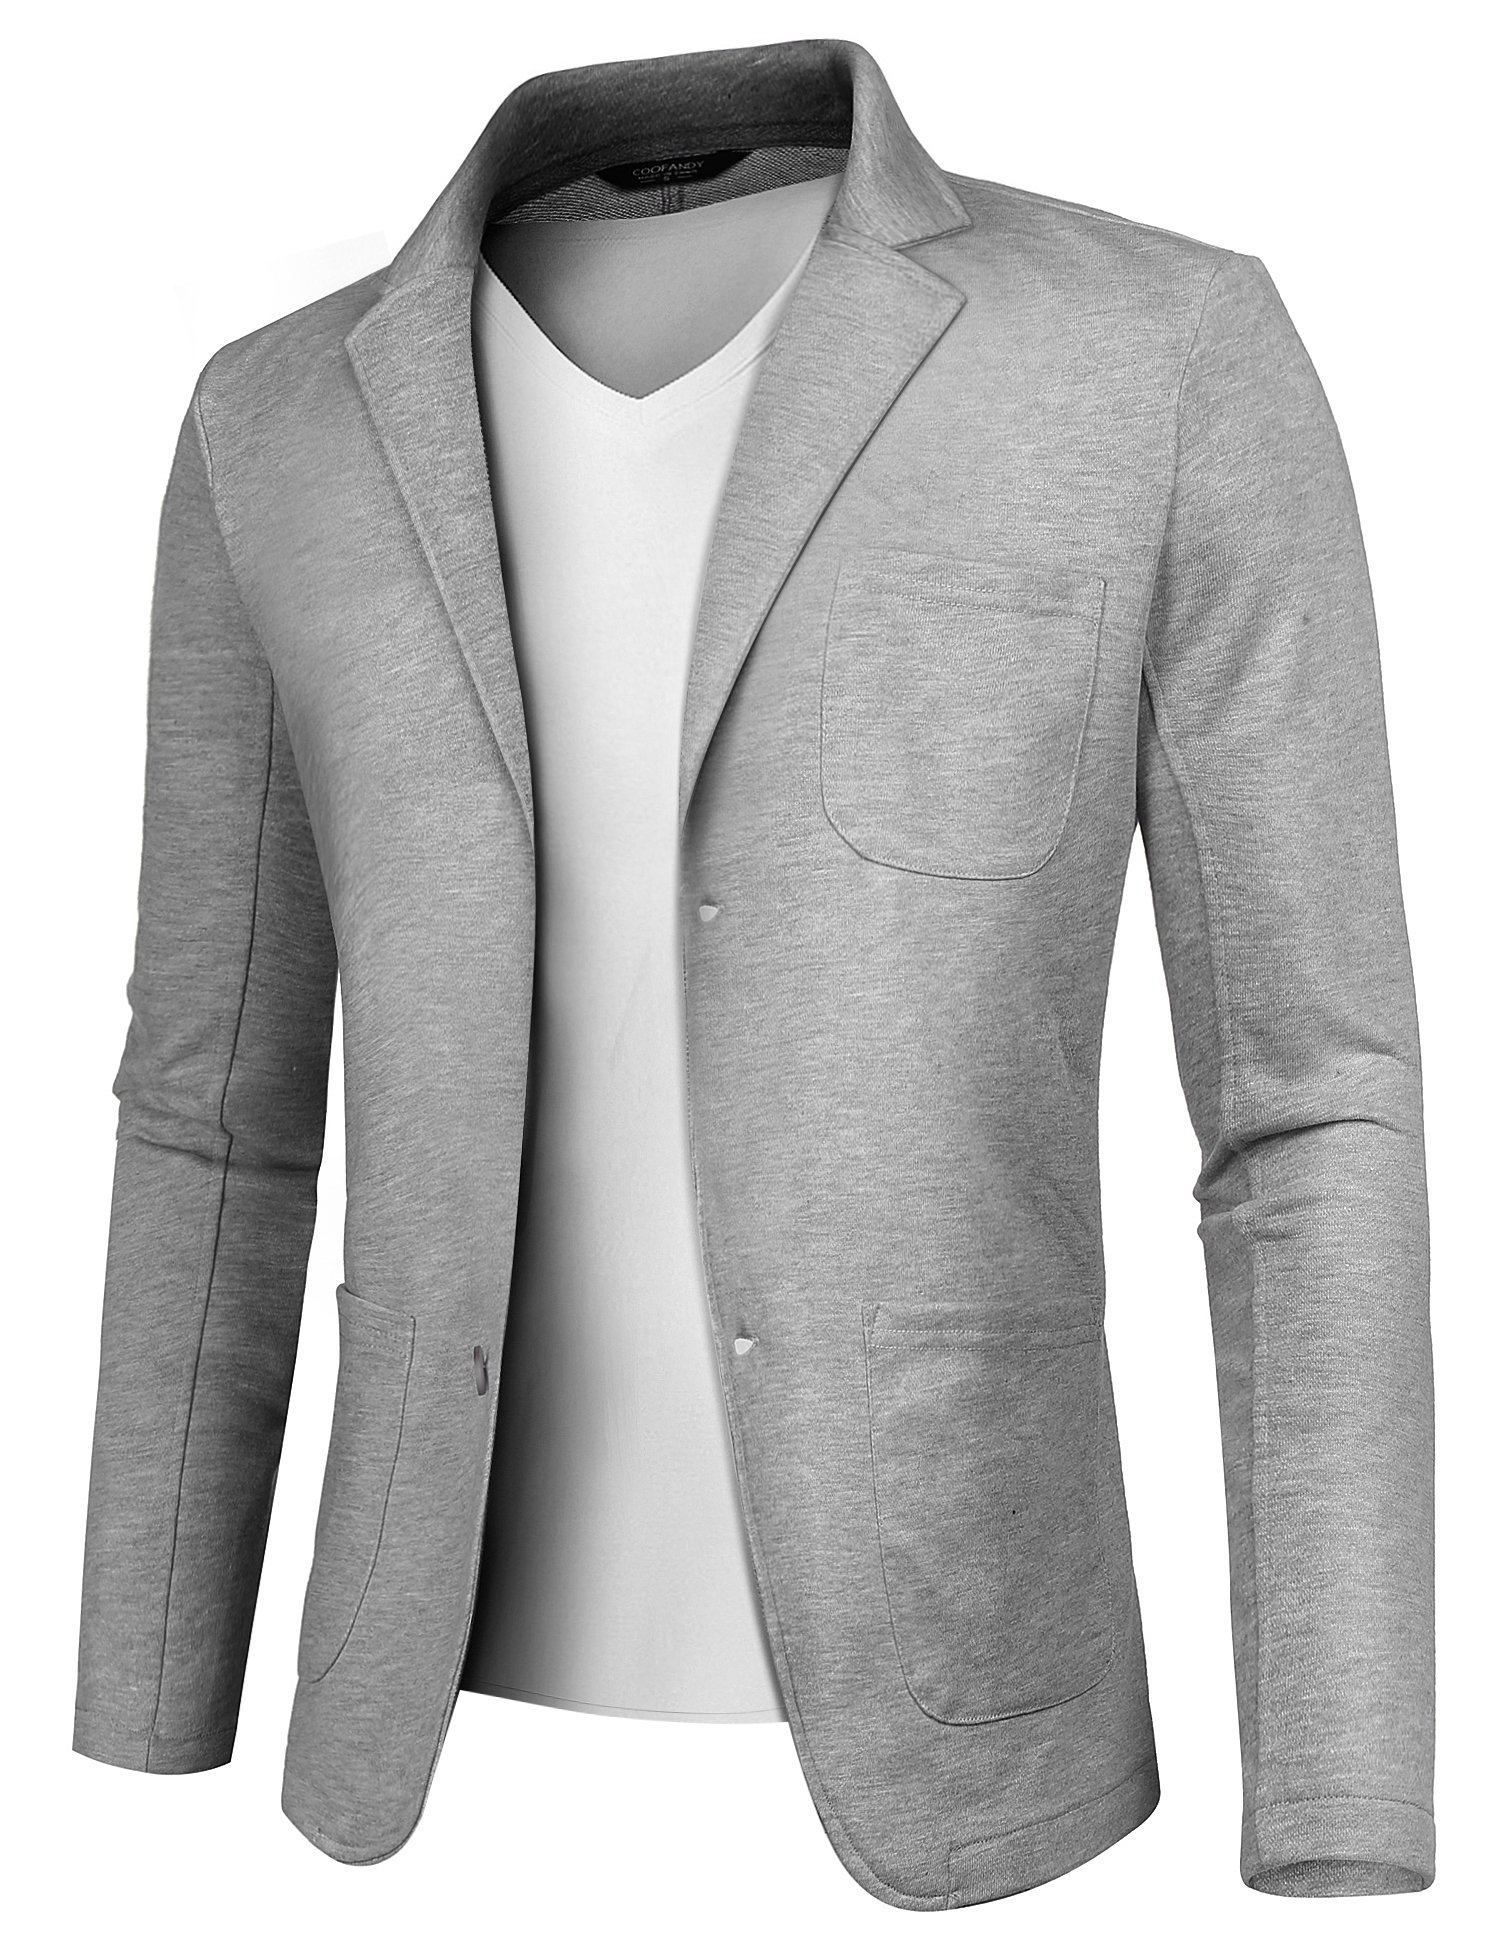 COOFANDY Mens Casual Two Button Suits Lapel Blazer Jacket Lightweight Sport Coat